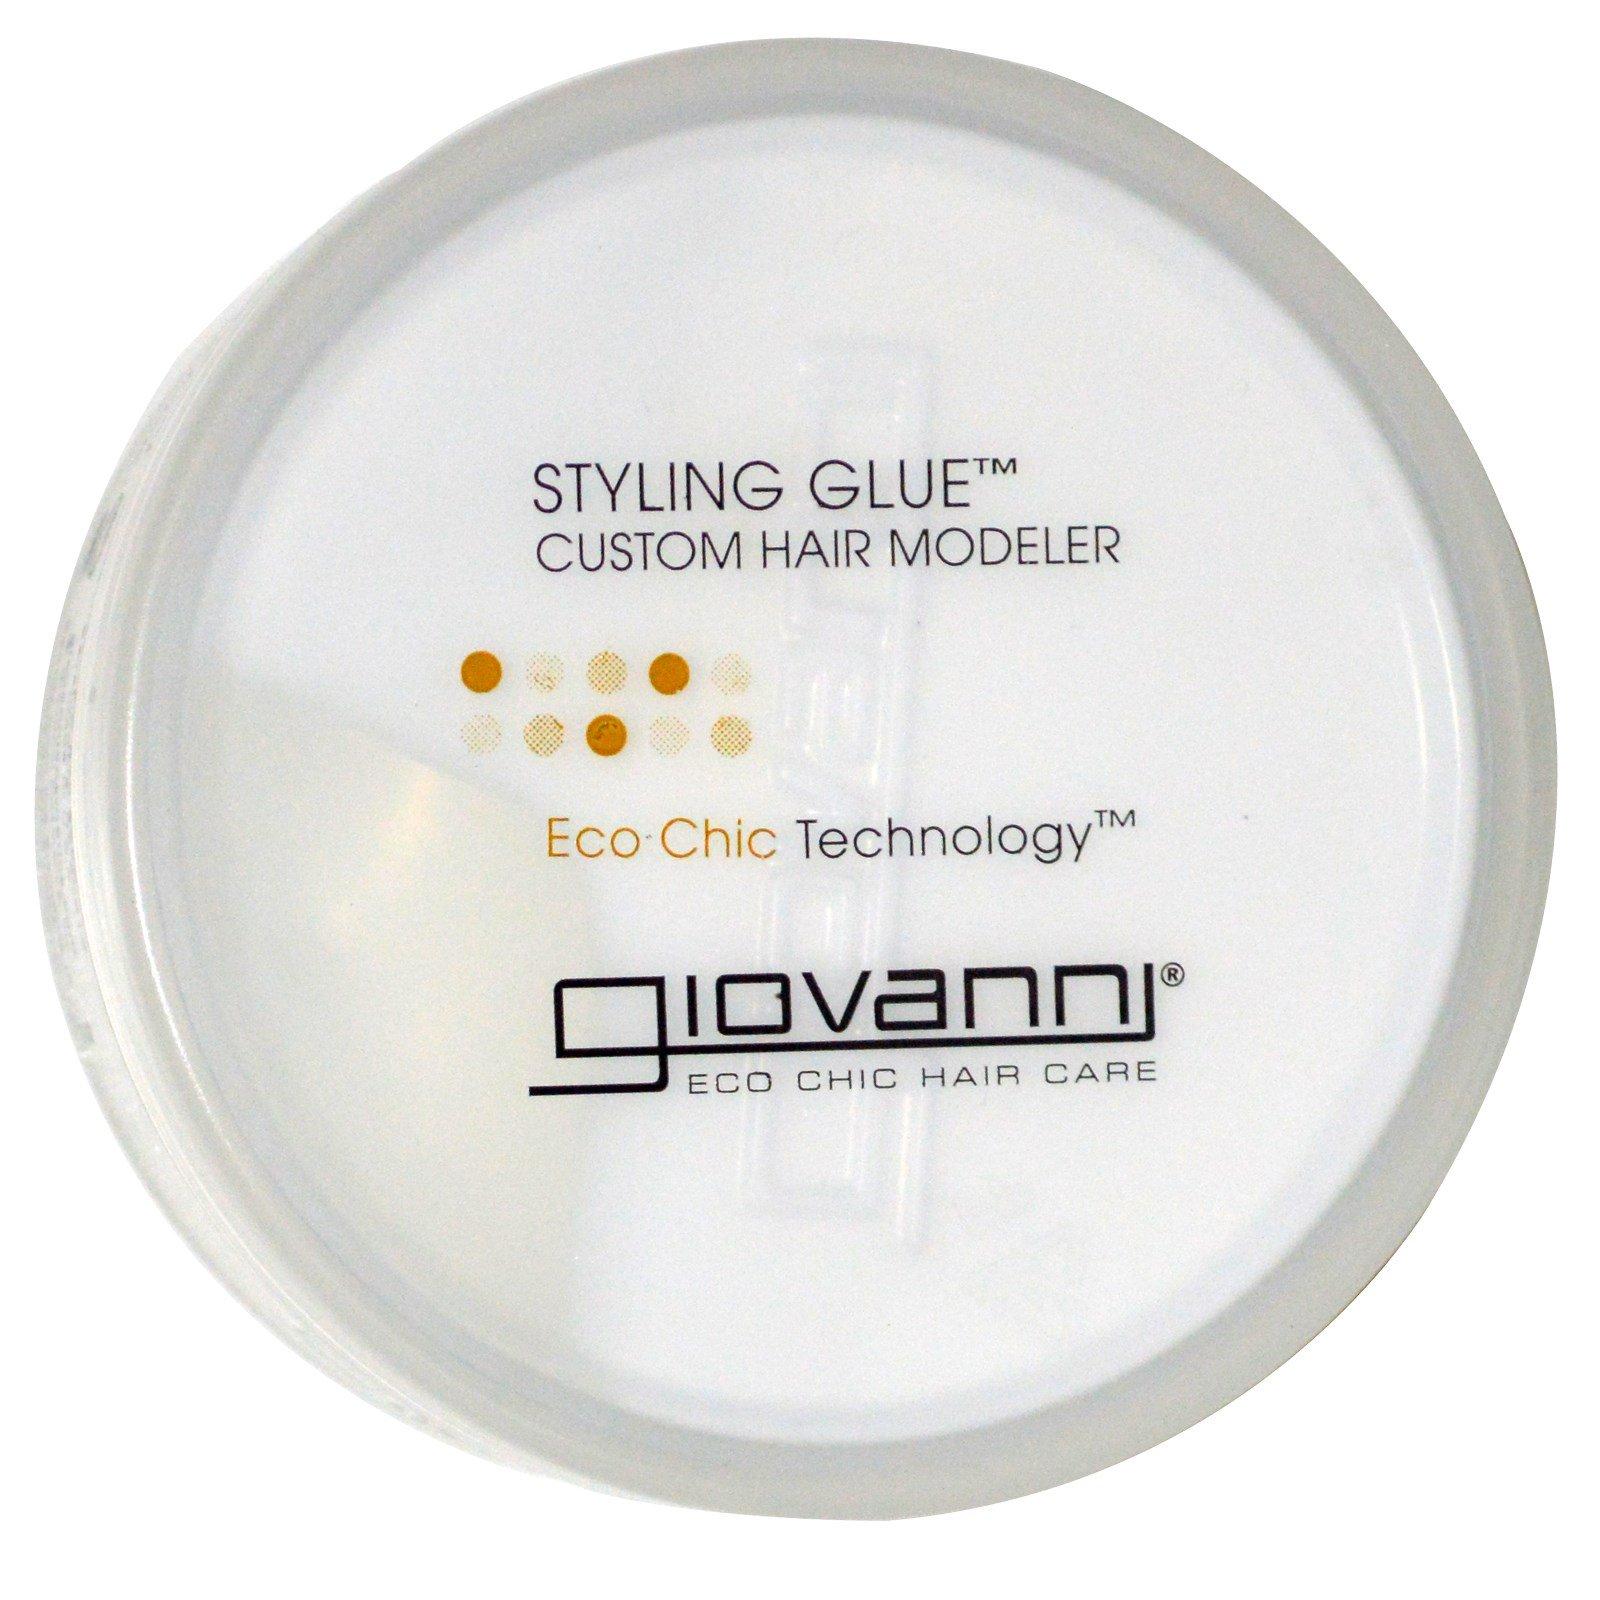 Giovanni, Воск для укладки, средство для укладки волос, 2 унции (57 г)